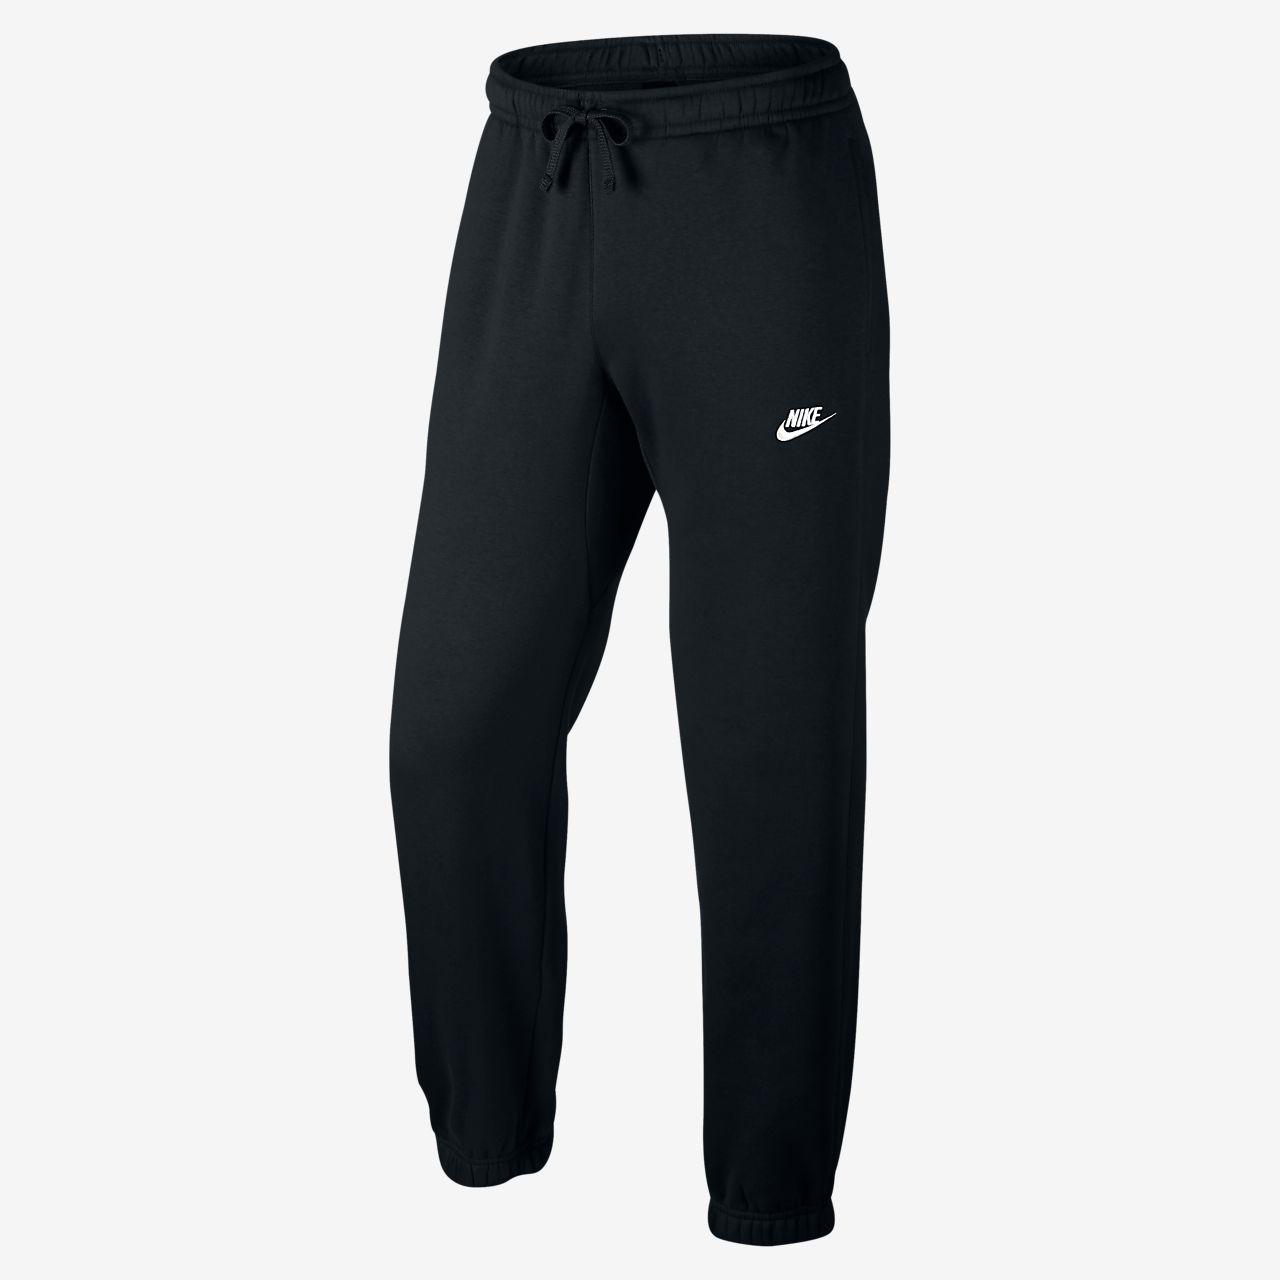 Nike Sportswear fleecebukse med standard passform for herre